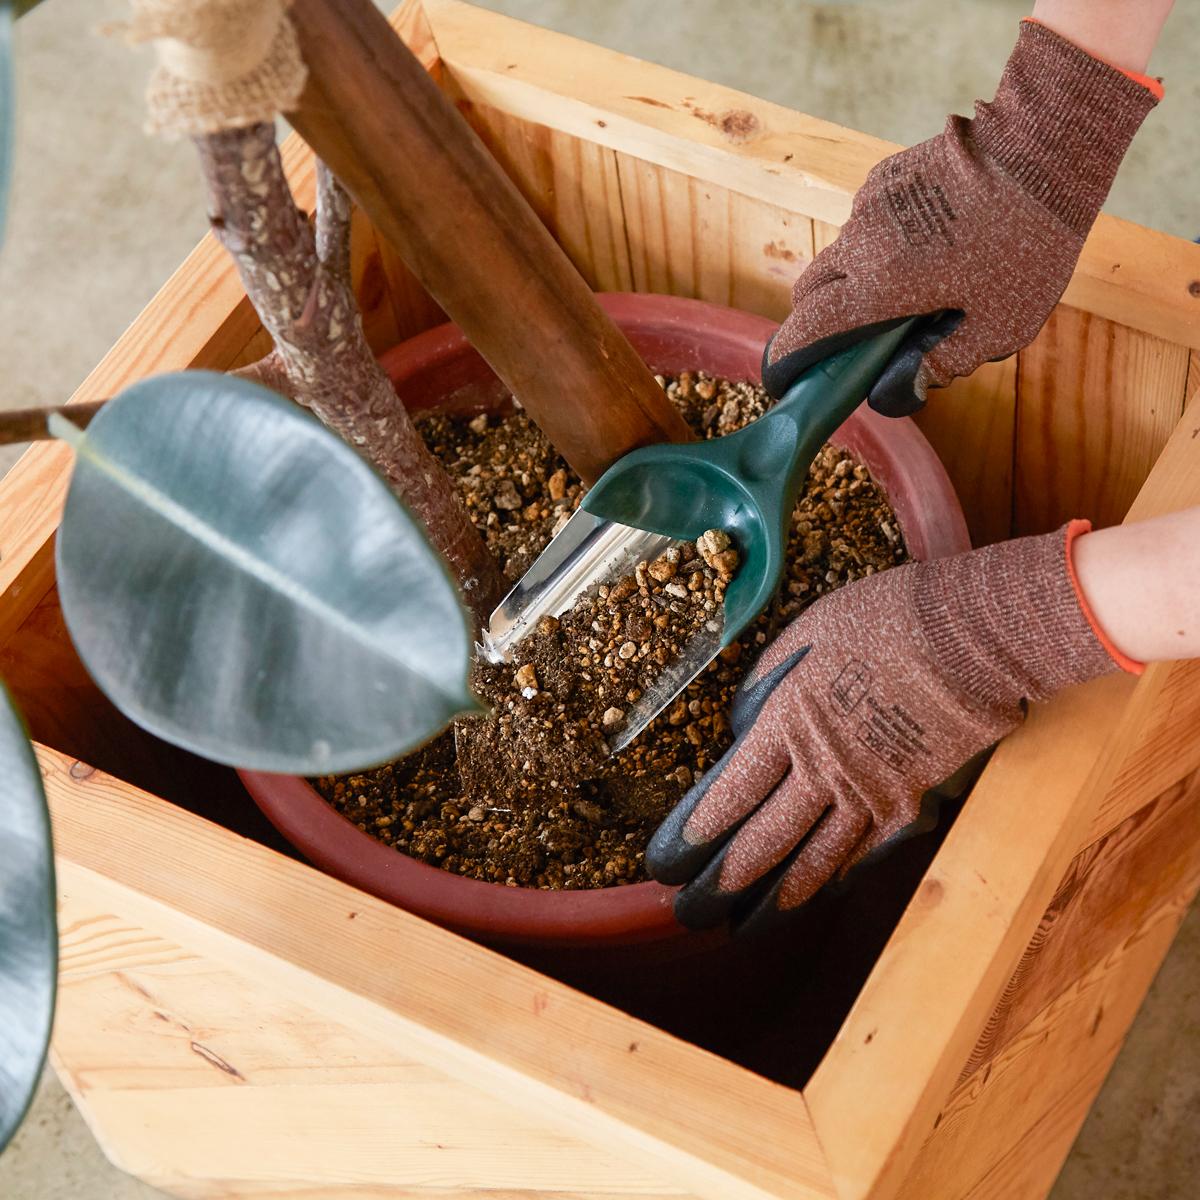 『workers gloves』は、ゴムのコーティング加工のために、独自の装置を開発。スマホを触れる。ネジもつまめる抜群のフィット感で、指先がスイスイ動く「作業用手袋」|workers gloves(ワーカーズグローブ)